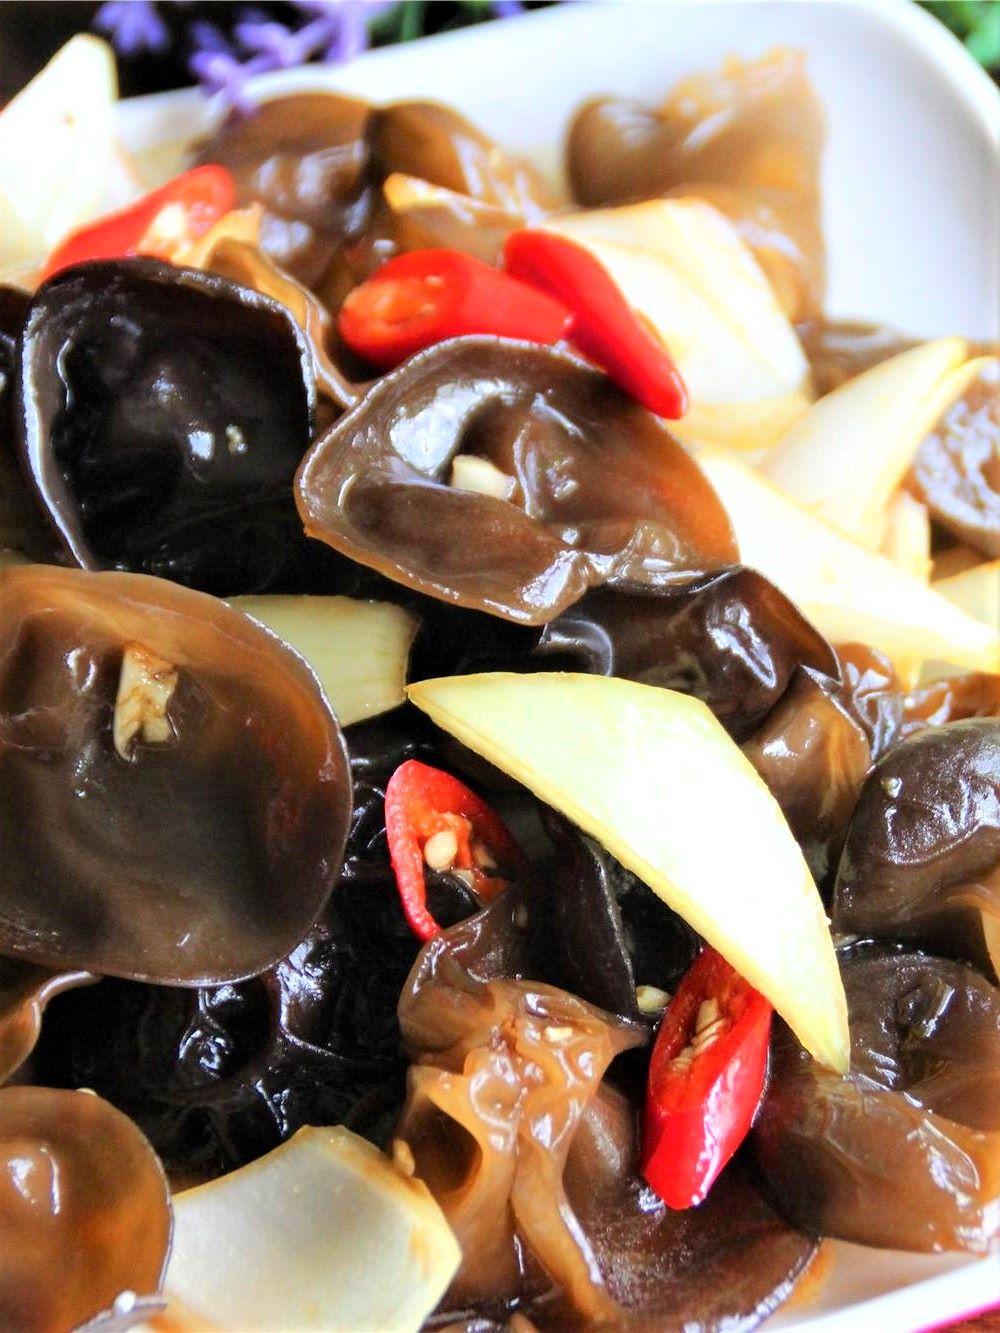 Black Fungus and onion salad recipe china cold dish 2021